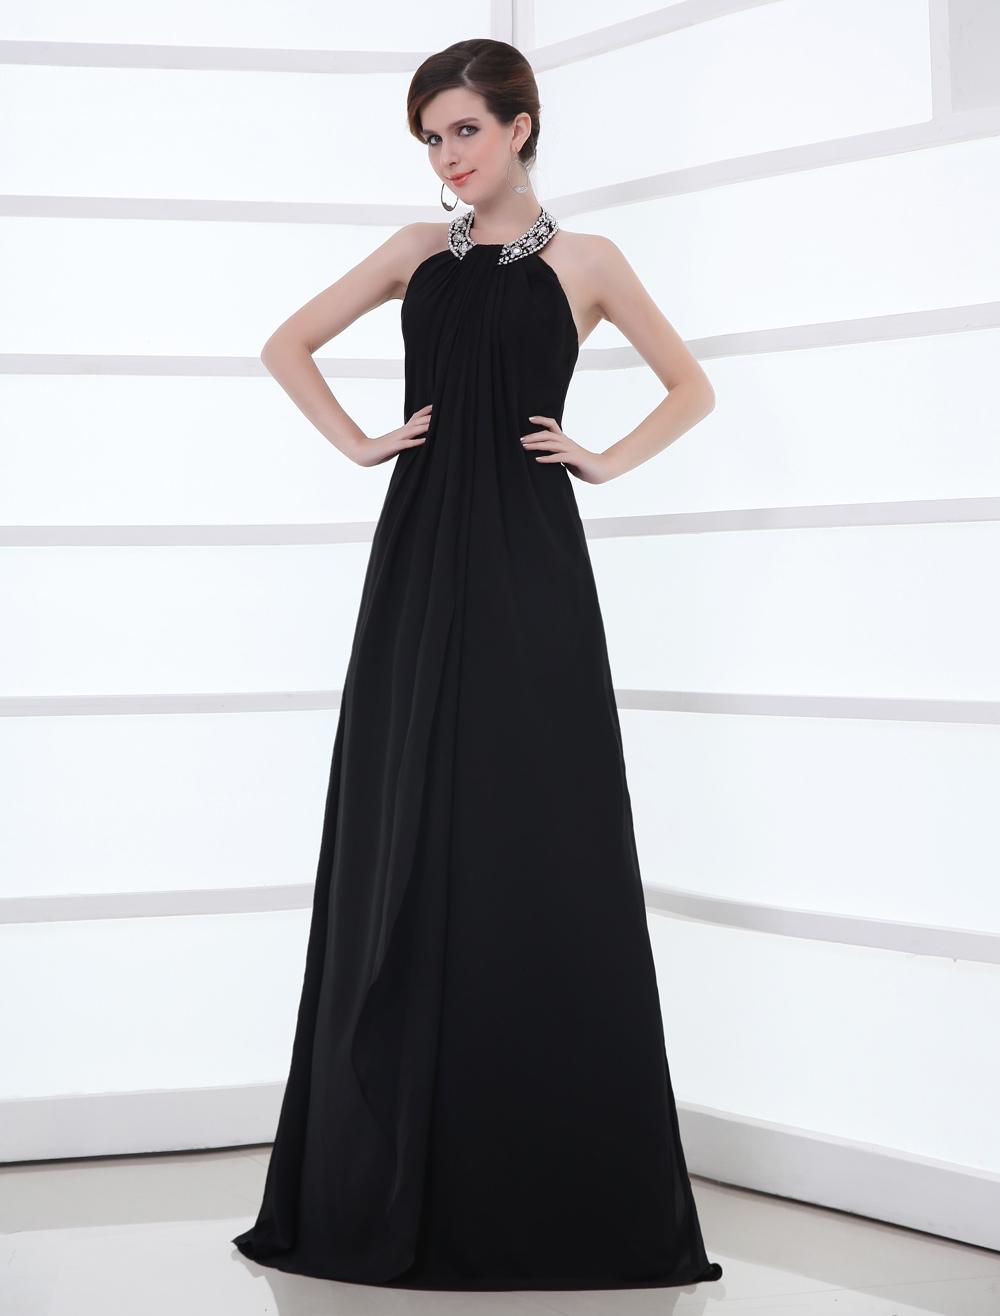 Black Chiffon Rhinestone Halter Evening Dress (Wedding Evening Dresses) photo